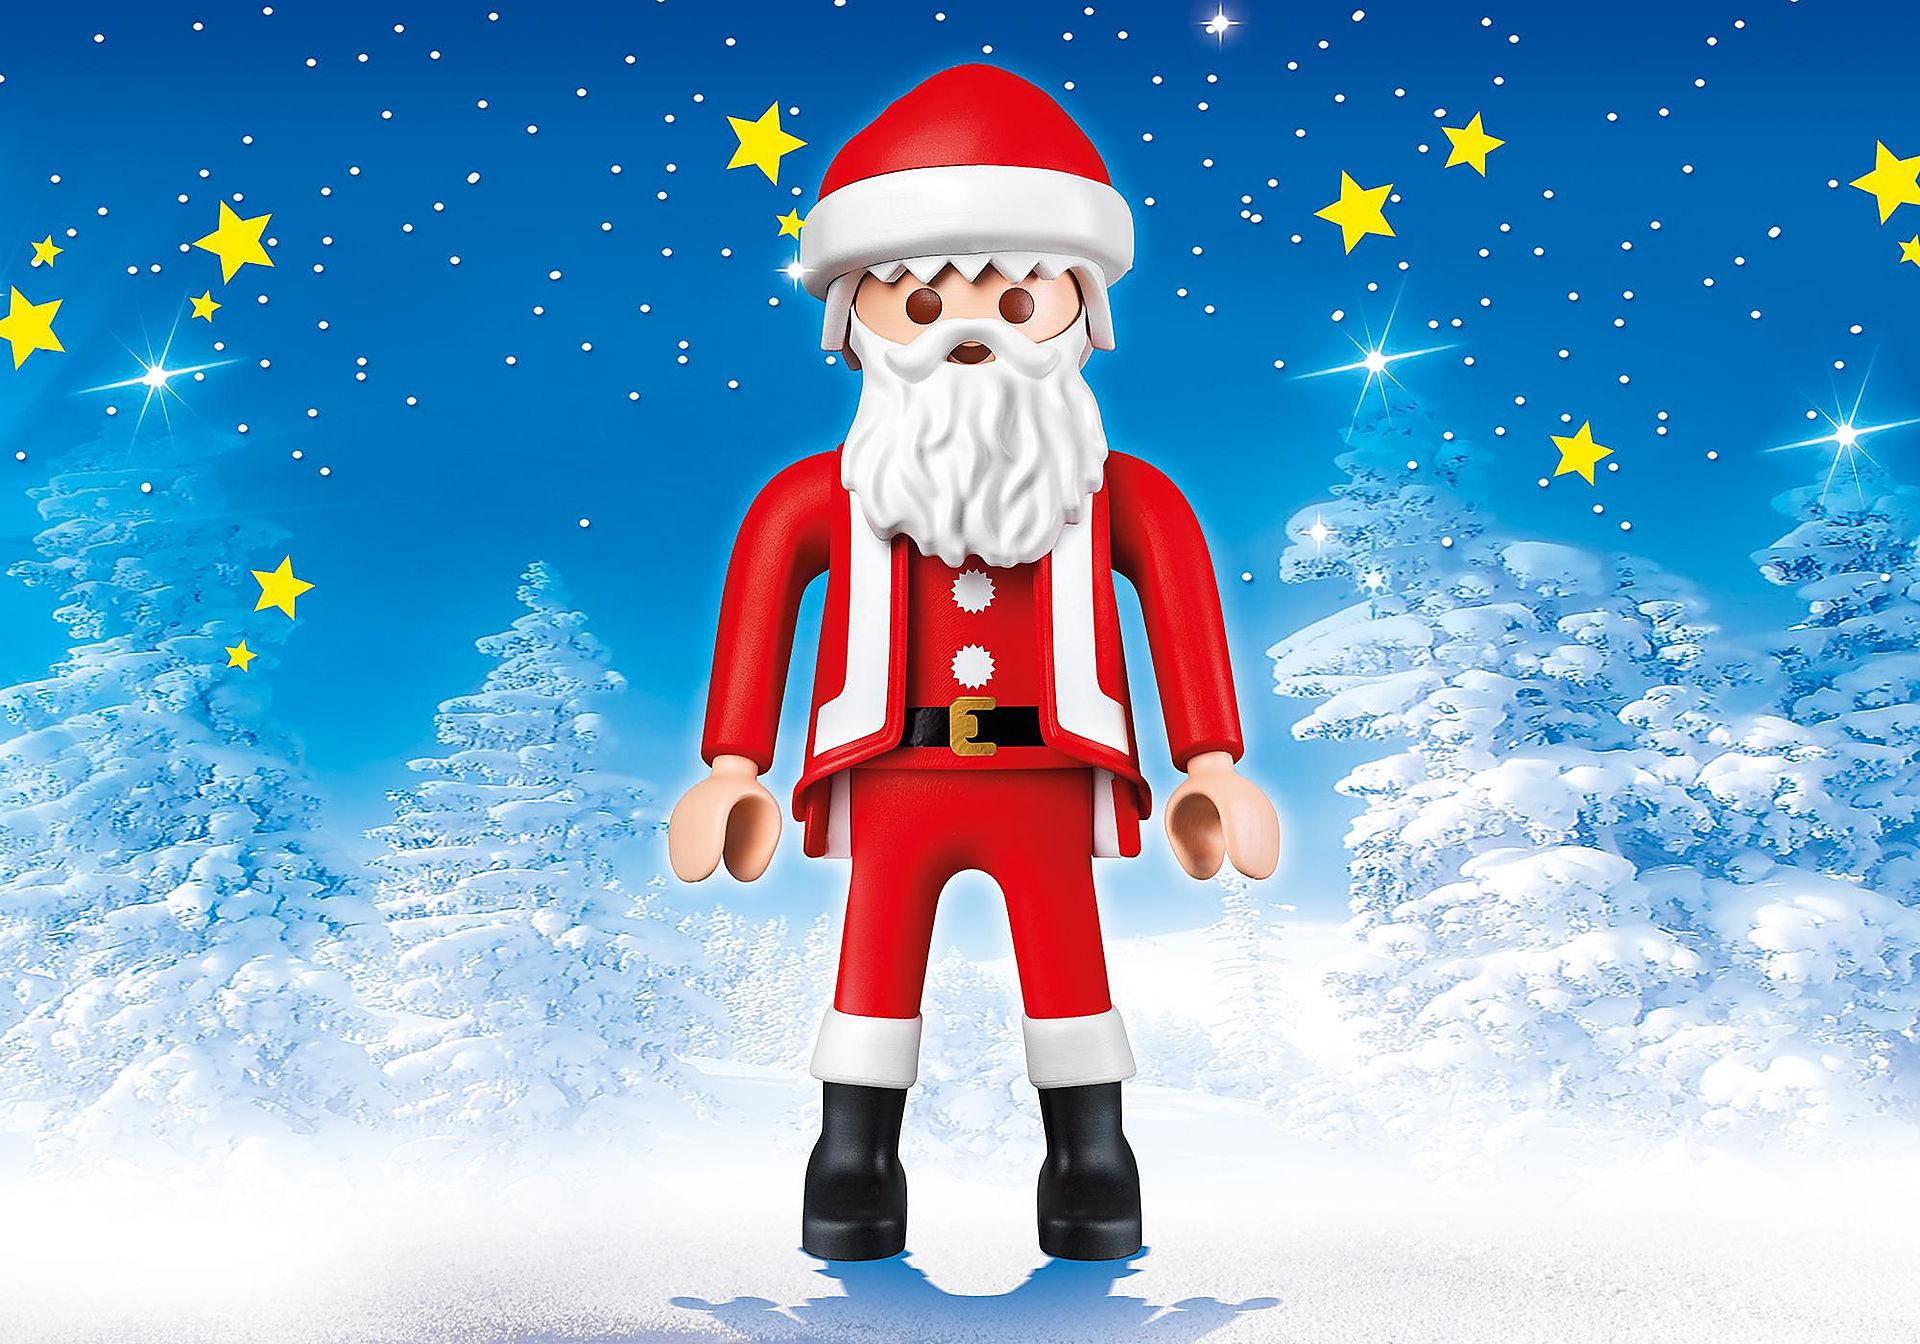 6629 PLAYMOBIL XXL Père Noël zoom image3